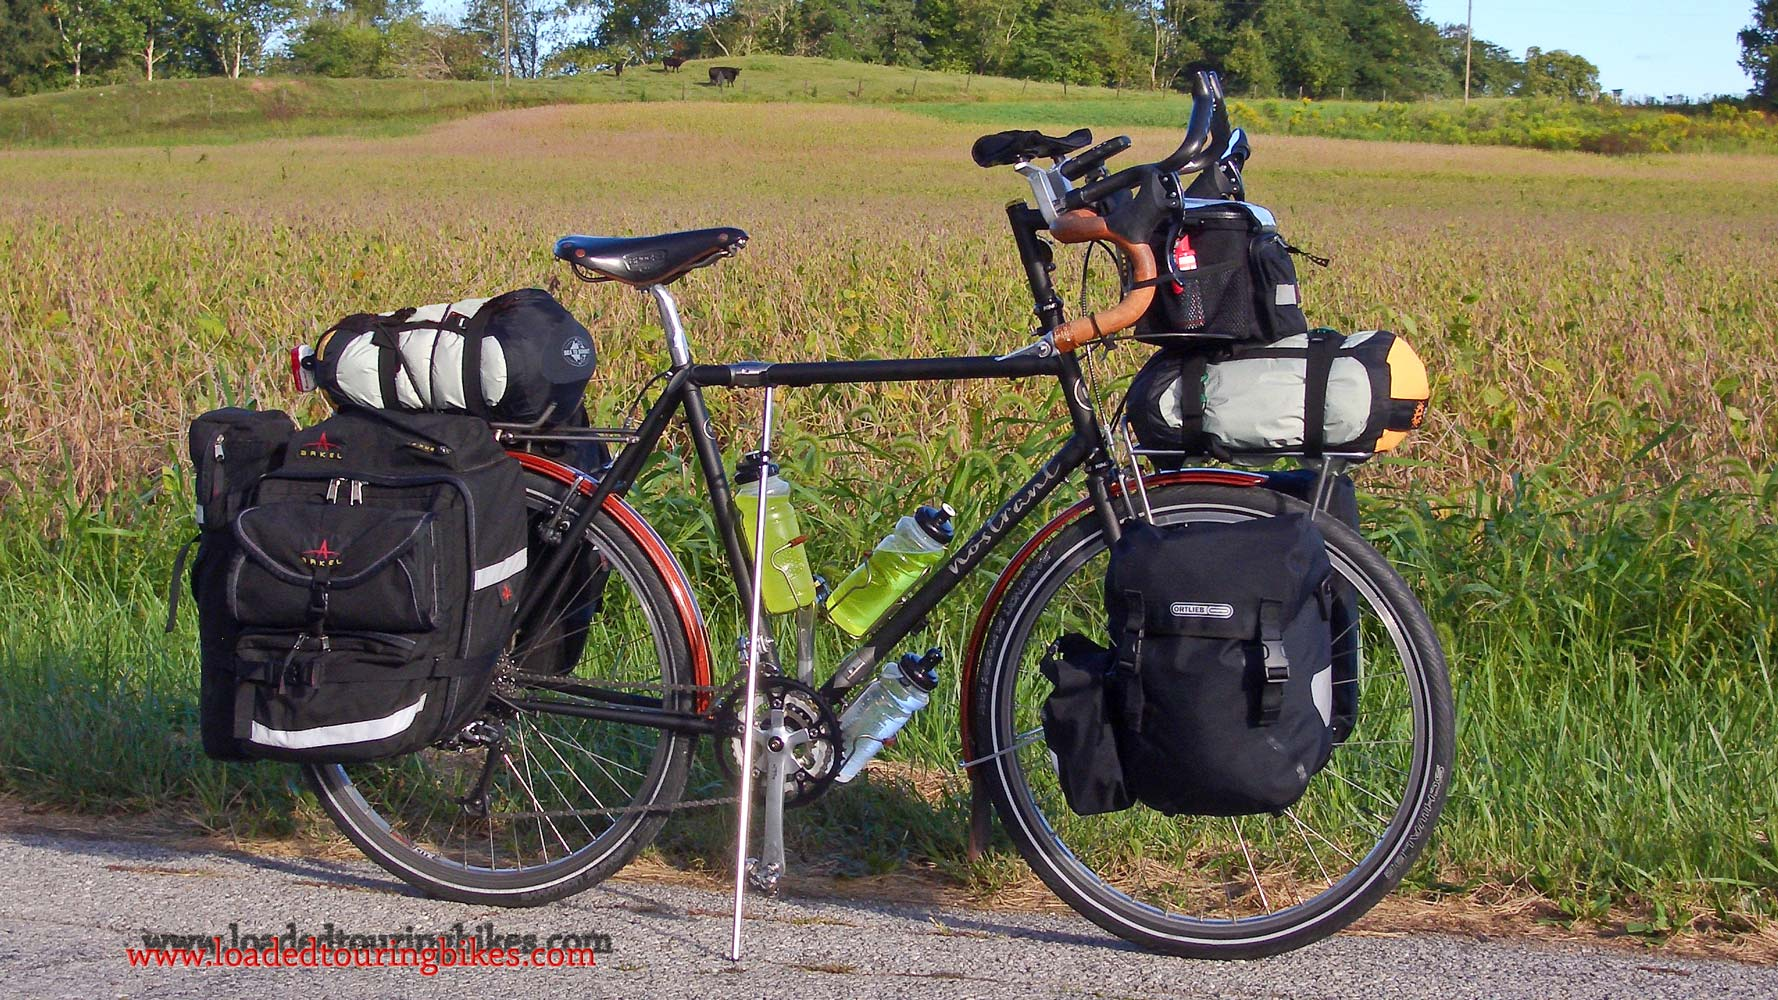 379    Tom touring Indiana - Nostrant Touring touring bike